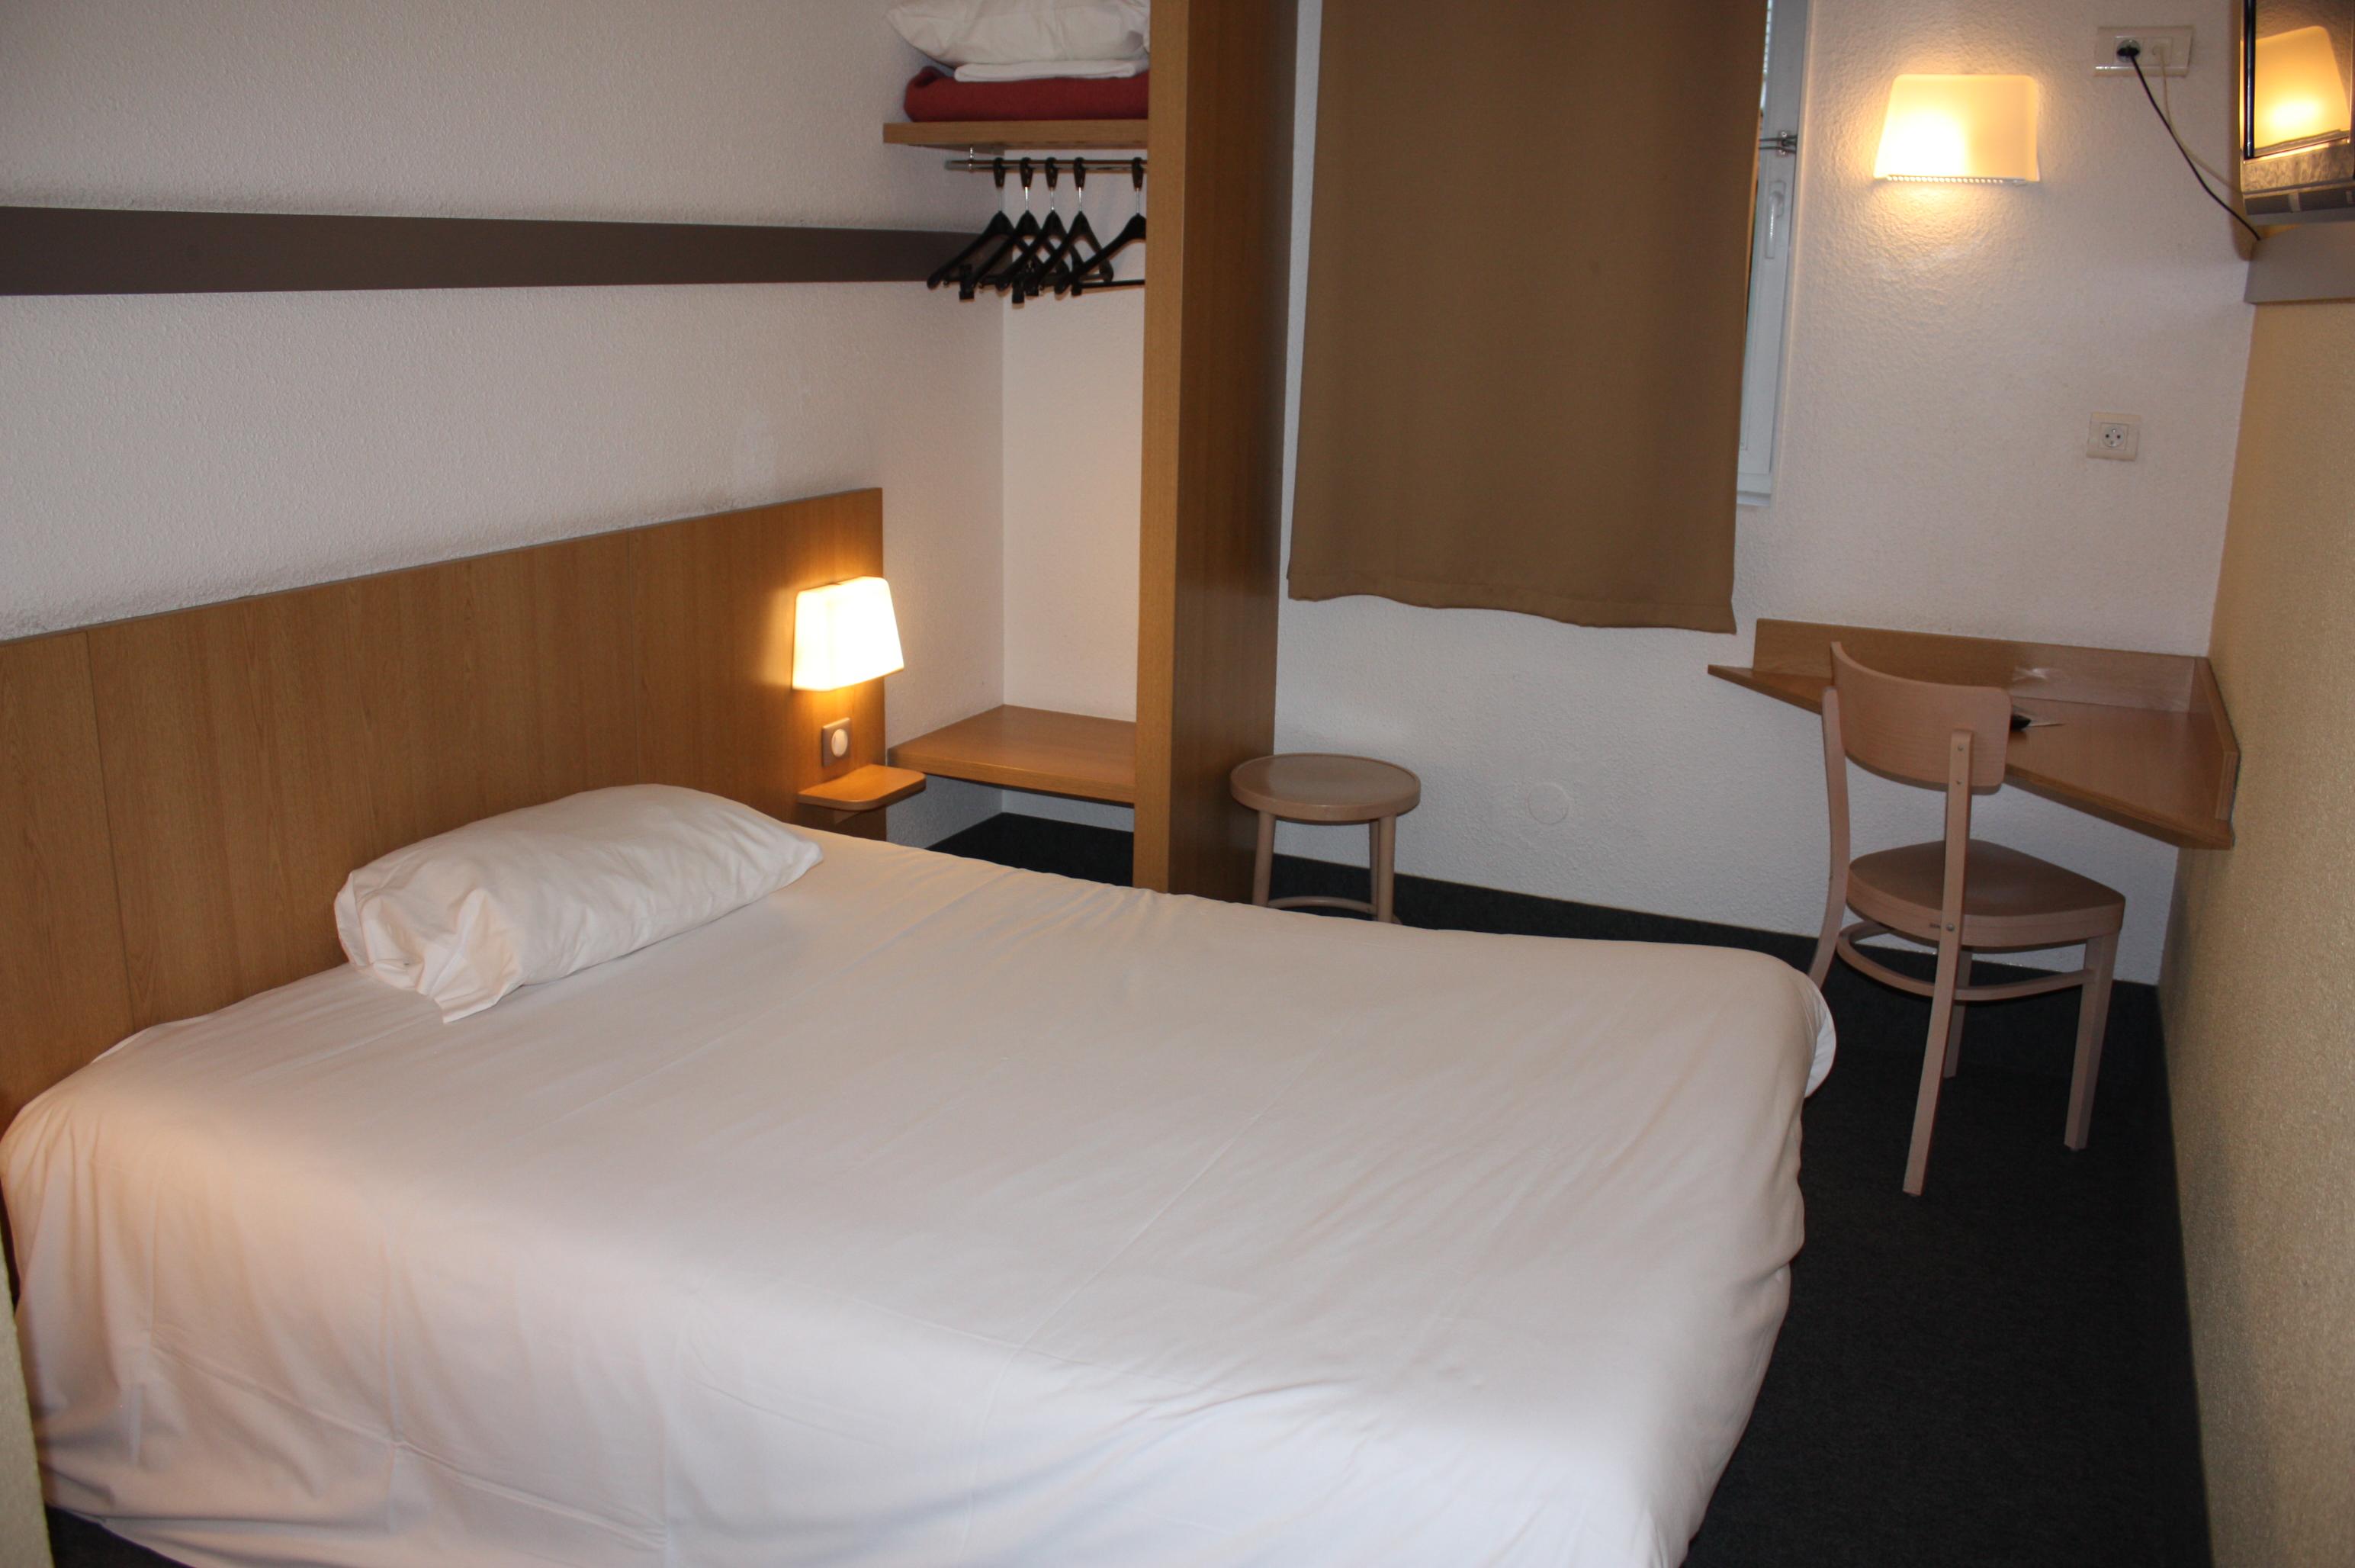 B&B Hotel Rennes Est Cesson Sevigne